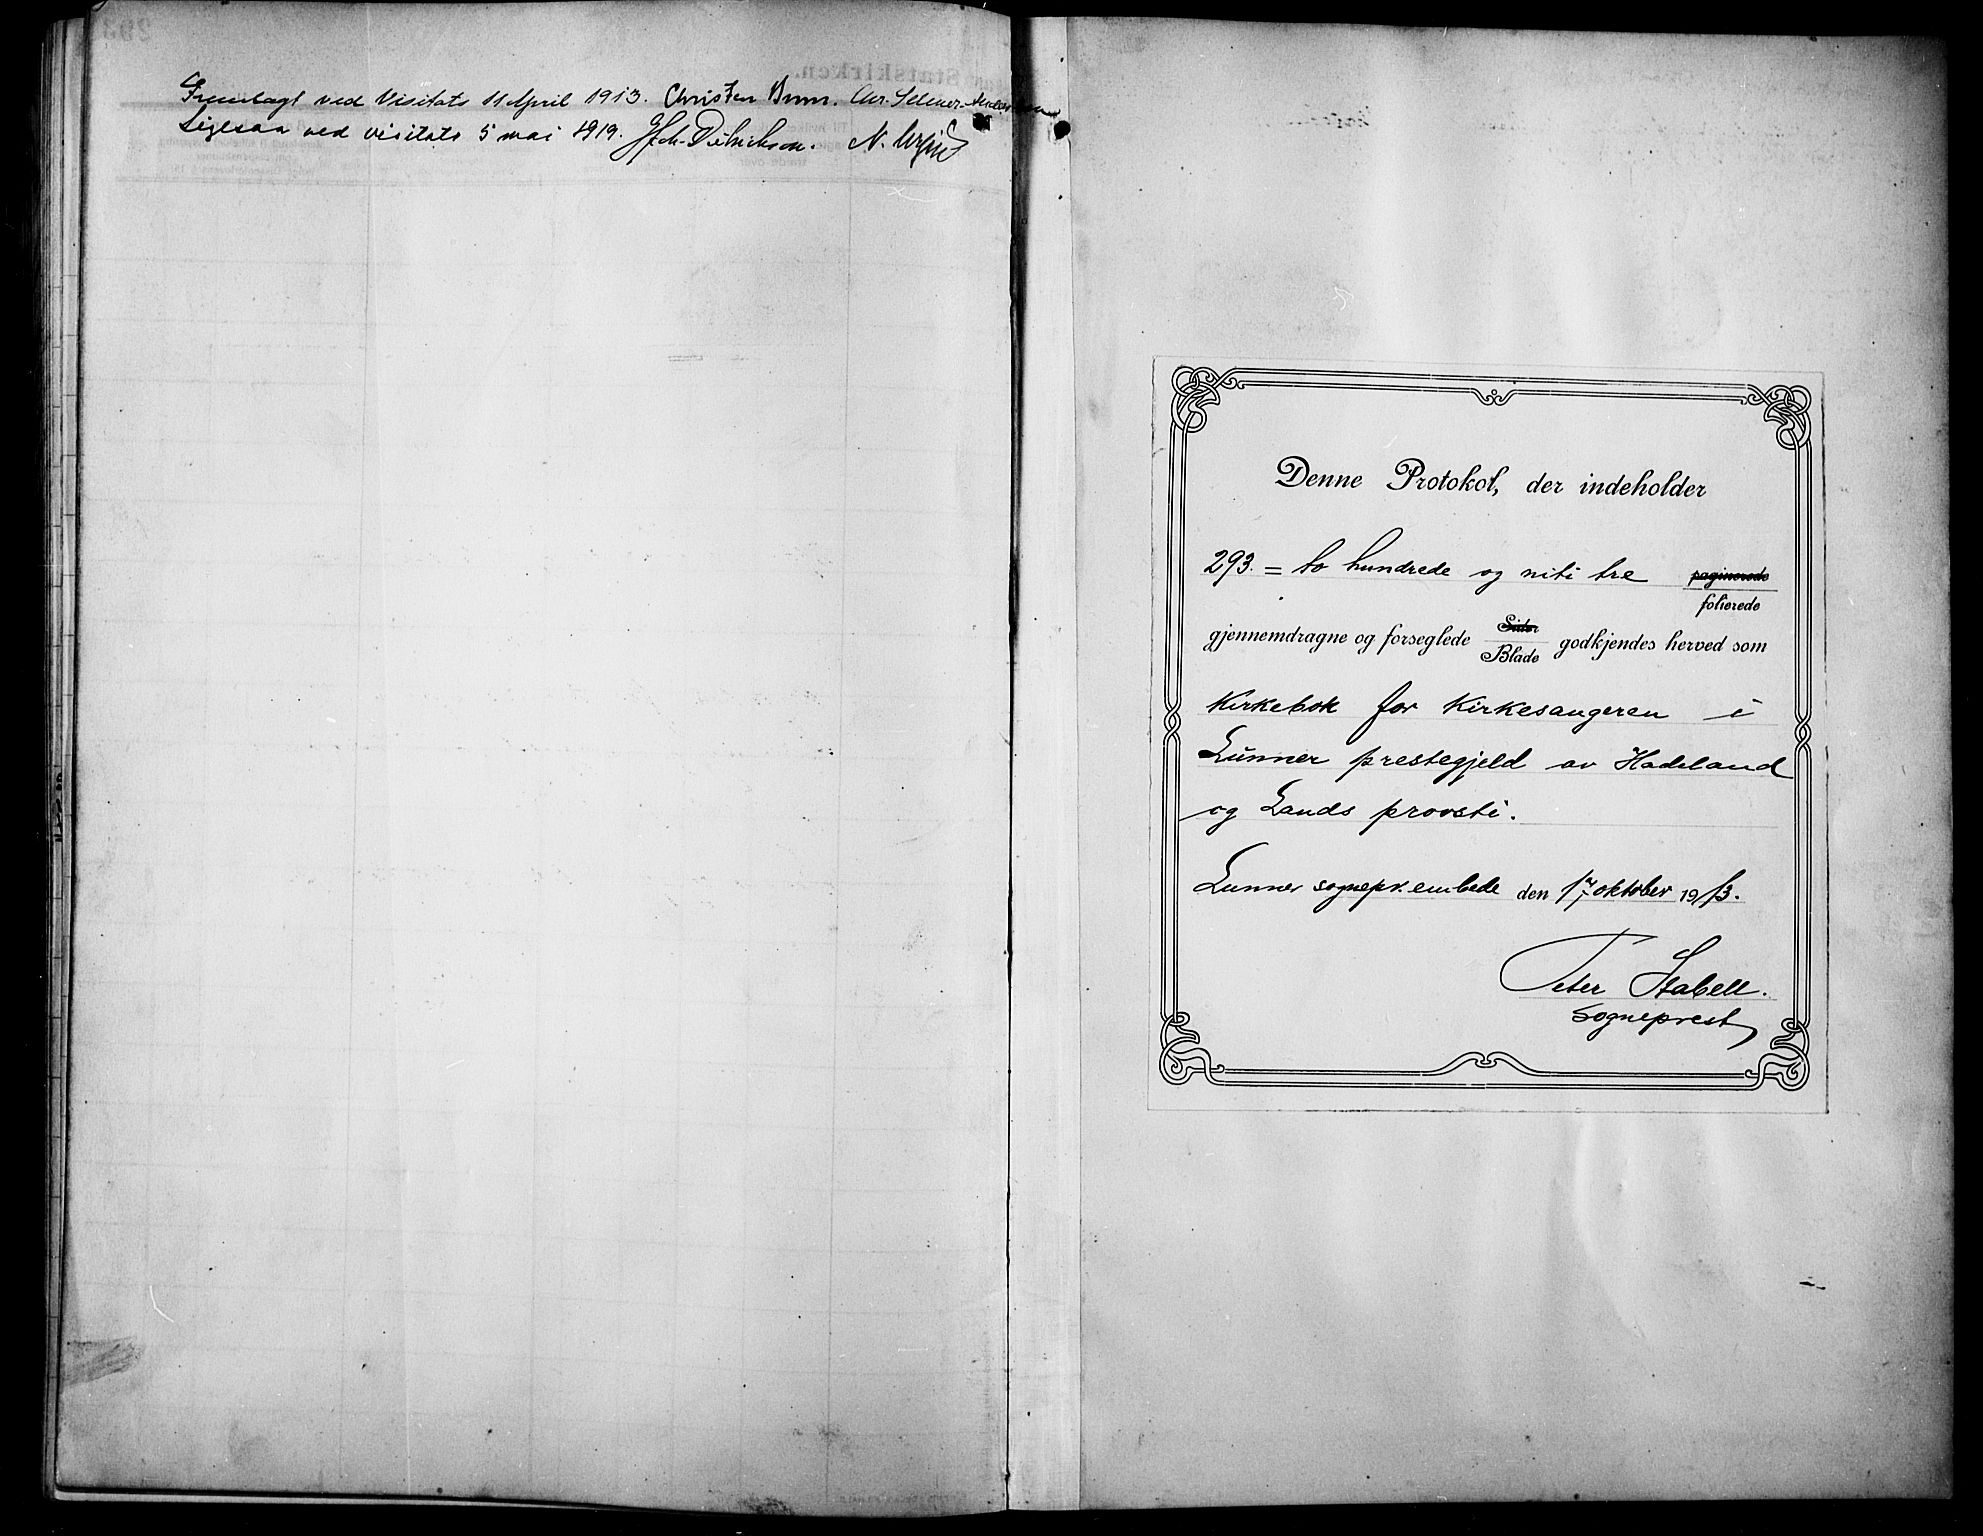 SAH, Lunner prestekontor, H/Ha/Hab/L0001: Klokkerbok nr. 1, 1909-1922